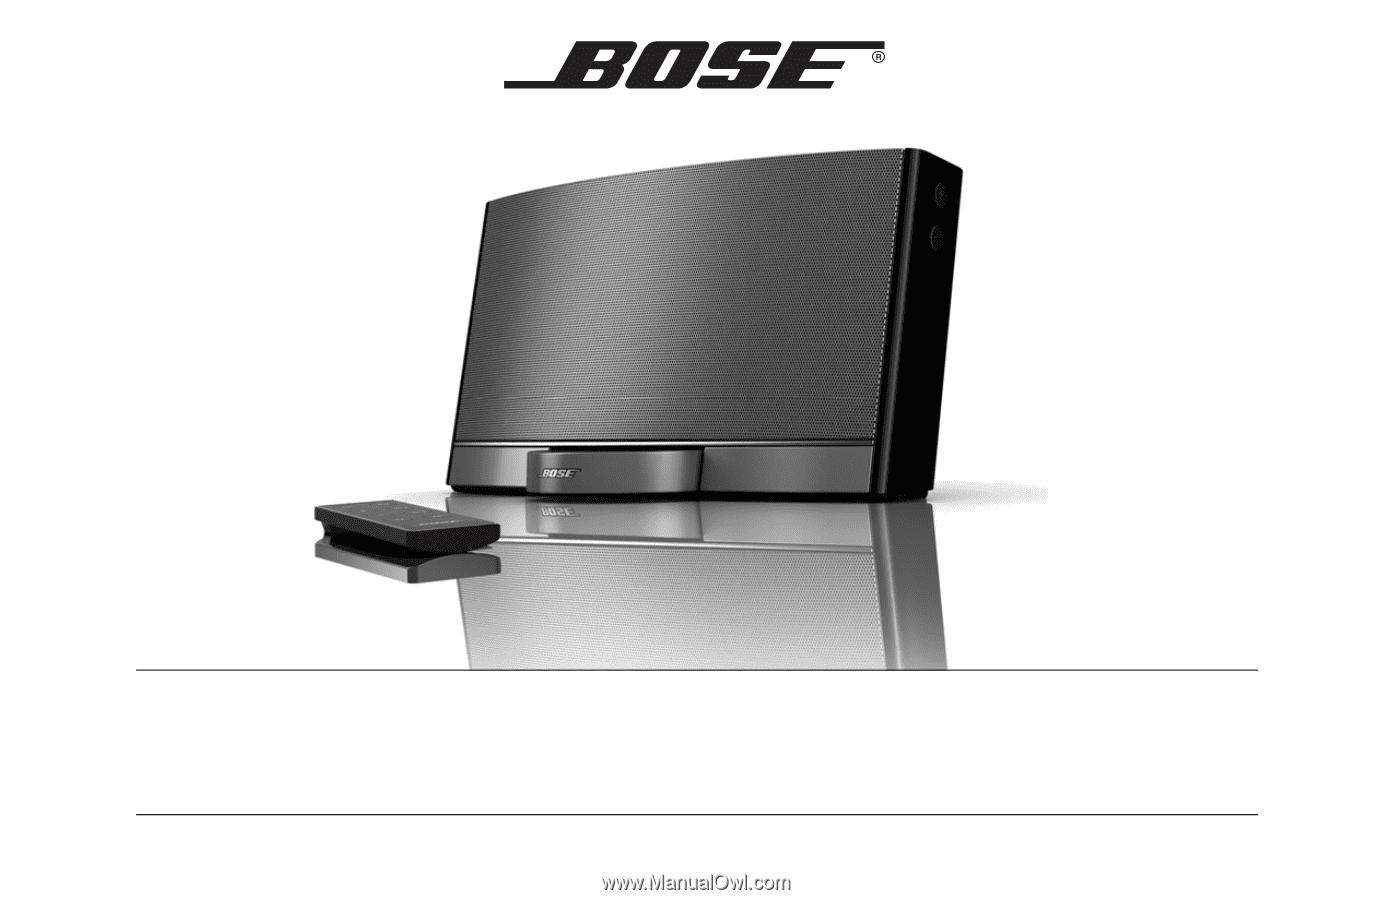 bose sounddock portable owners guide rh manualowl com SoundDock Portable Bose Speakers Bose Portable SoundDock Battery